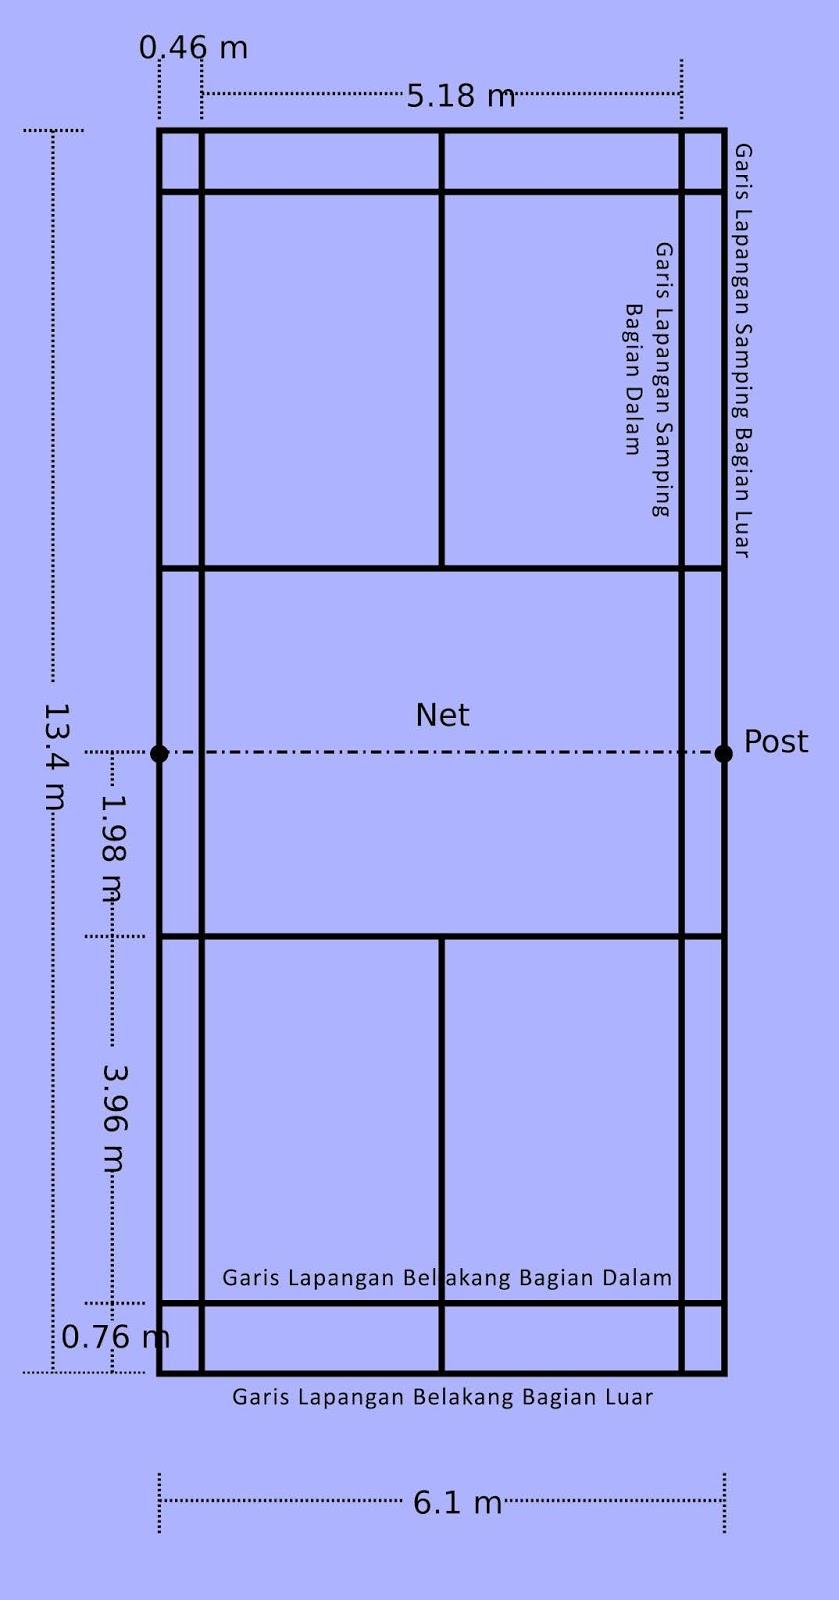 Ukuran Lapangan Badminton Lengkap Gambar Dan Keterangannya